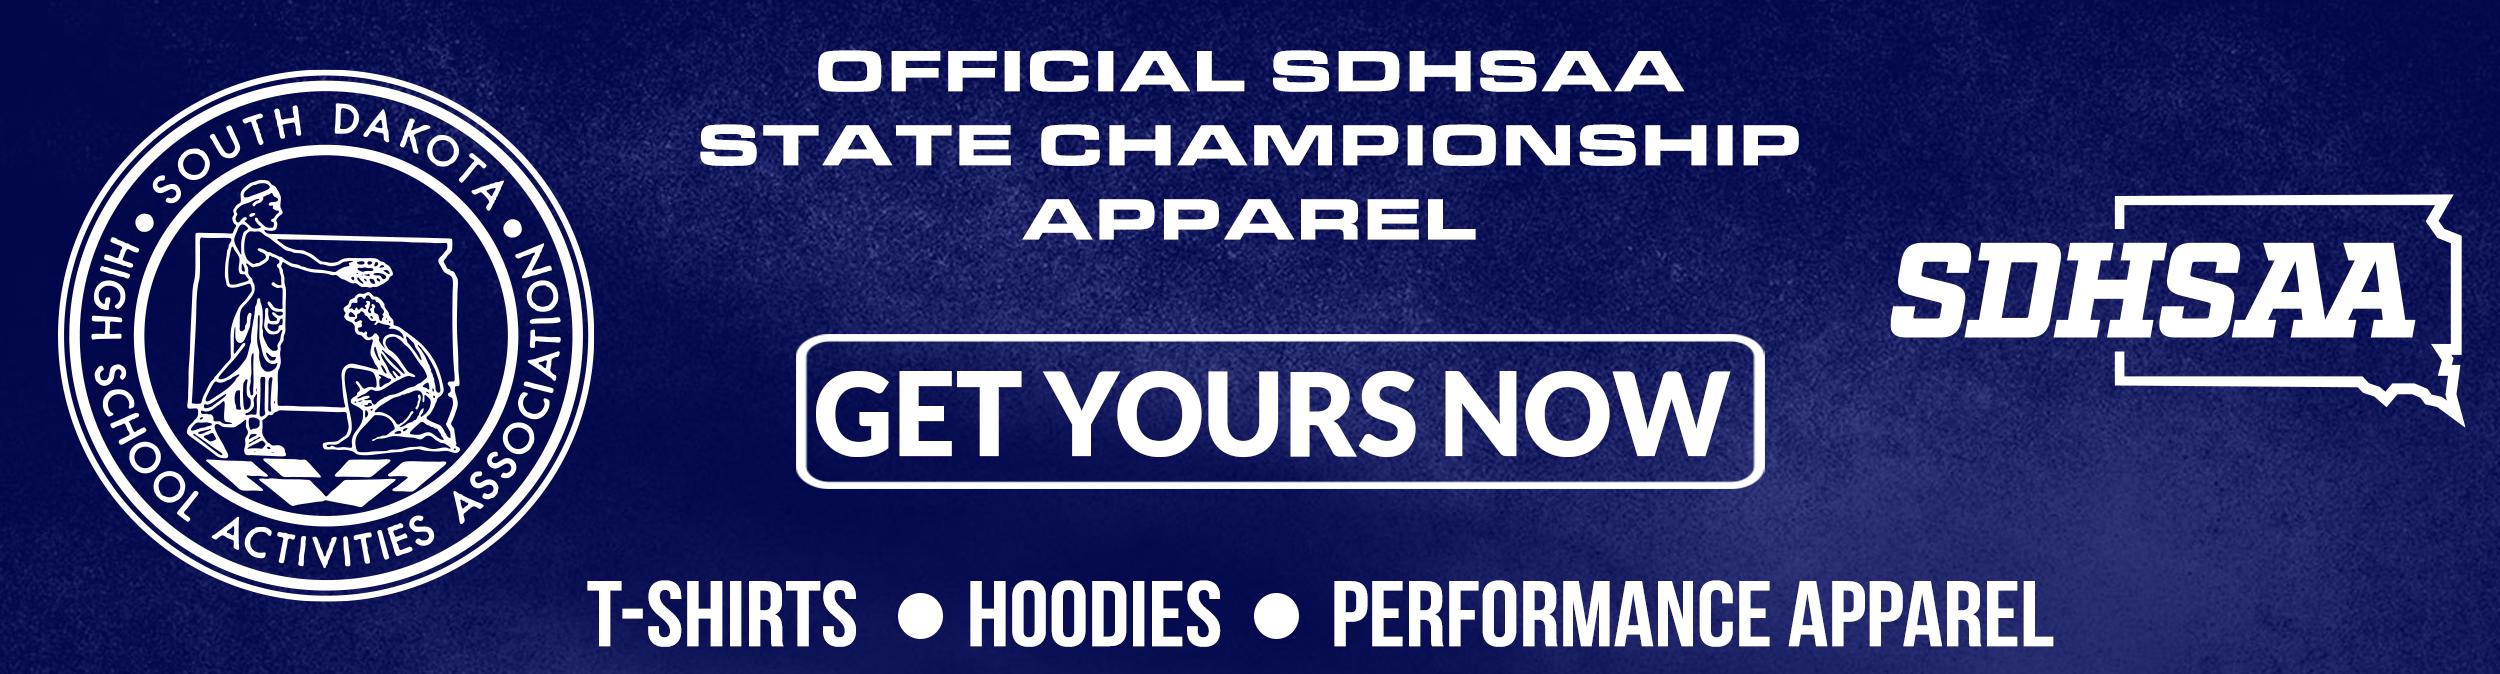 SDHSAA State Championships